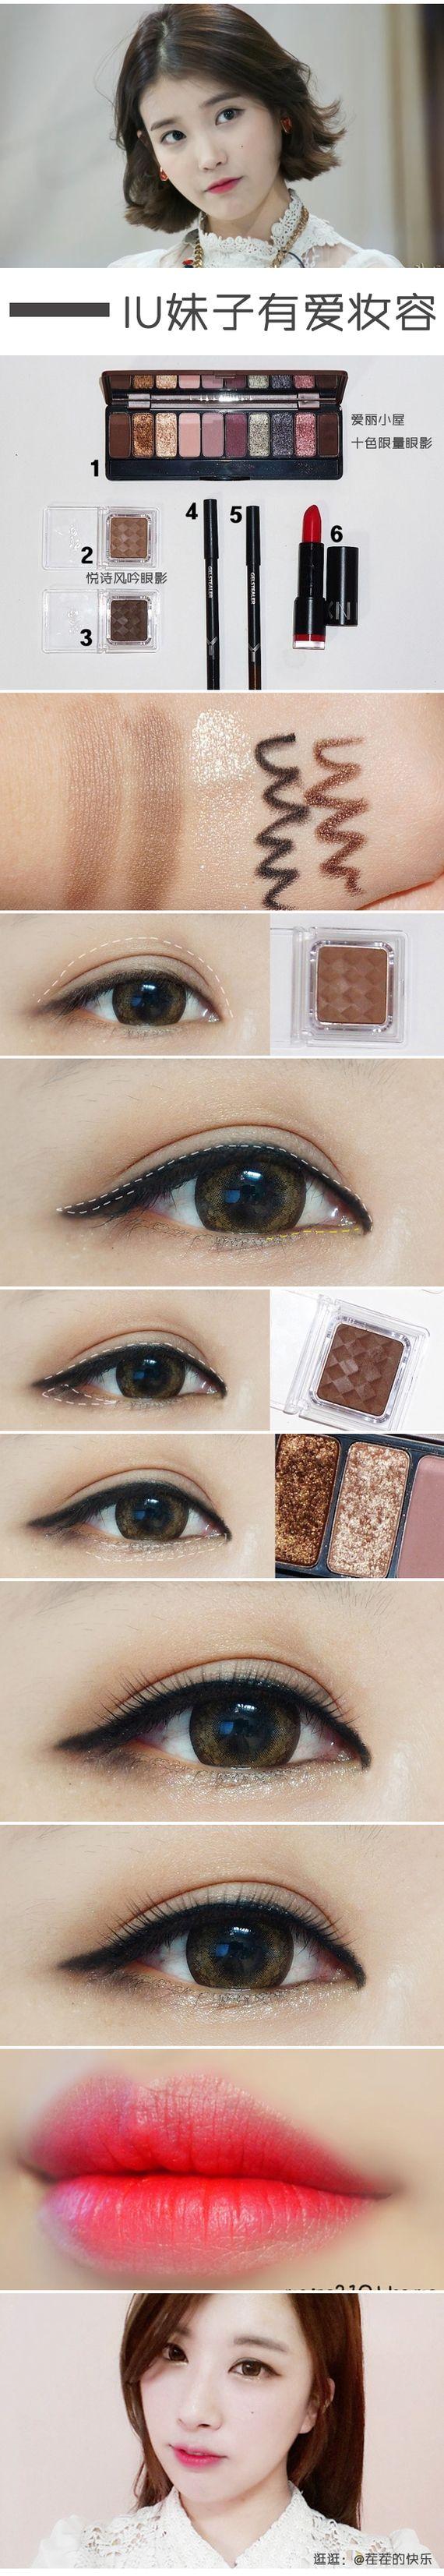 // IU k-pop korean makeup tutorial http://nerium.kr/preenroll/debbiekrug?alias=debbiekrug   www.AsianSkincare.Rocks